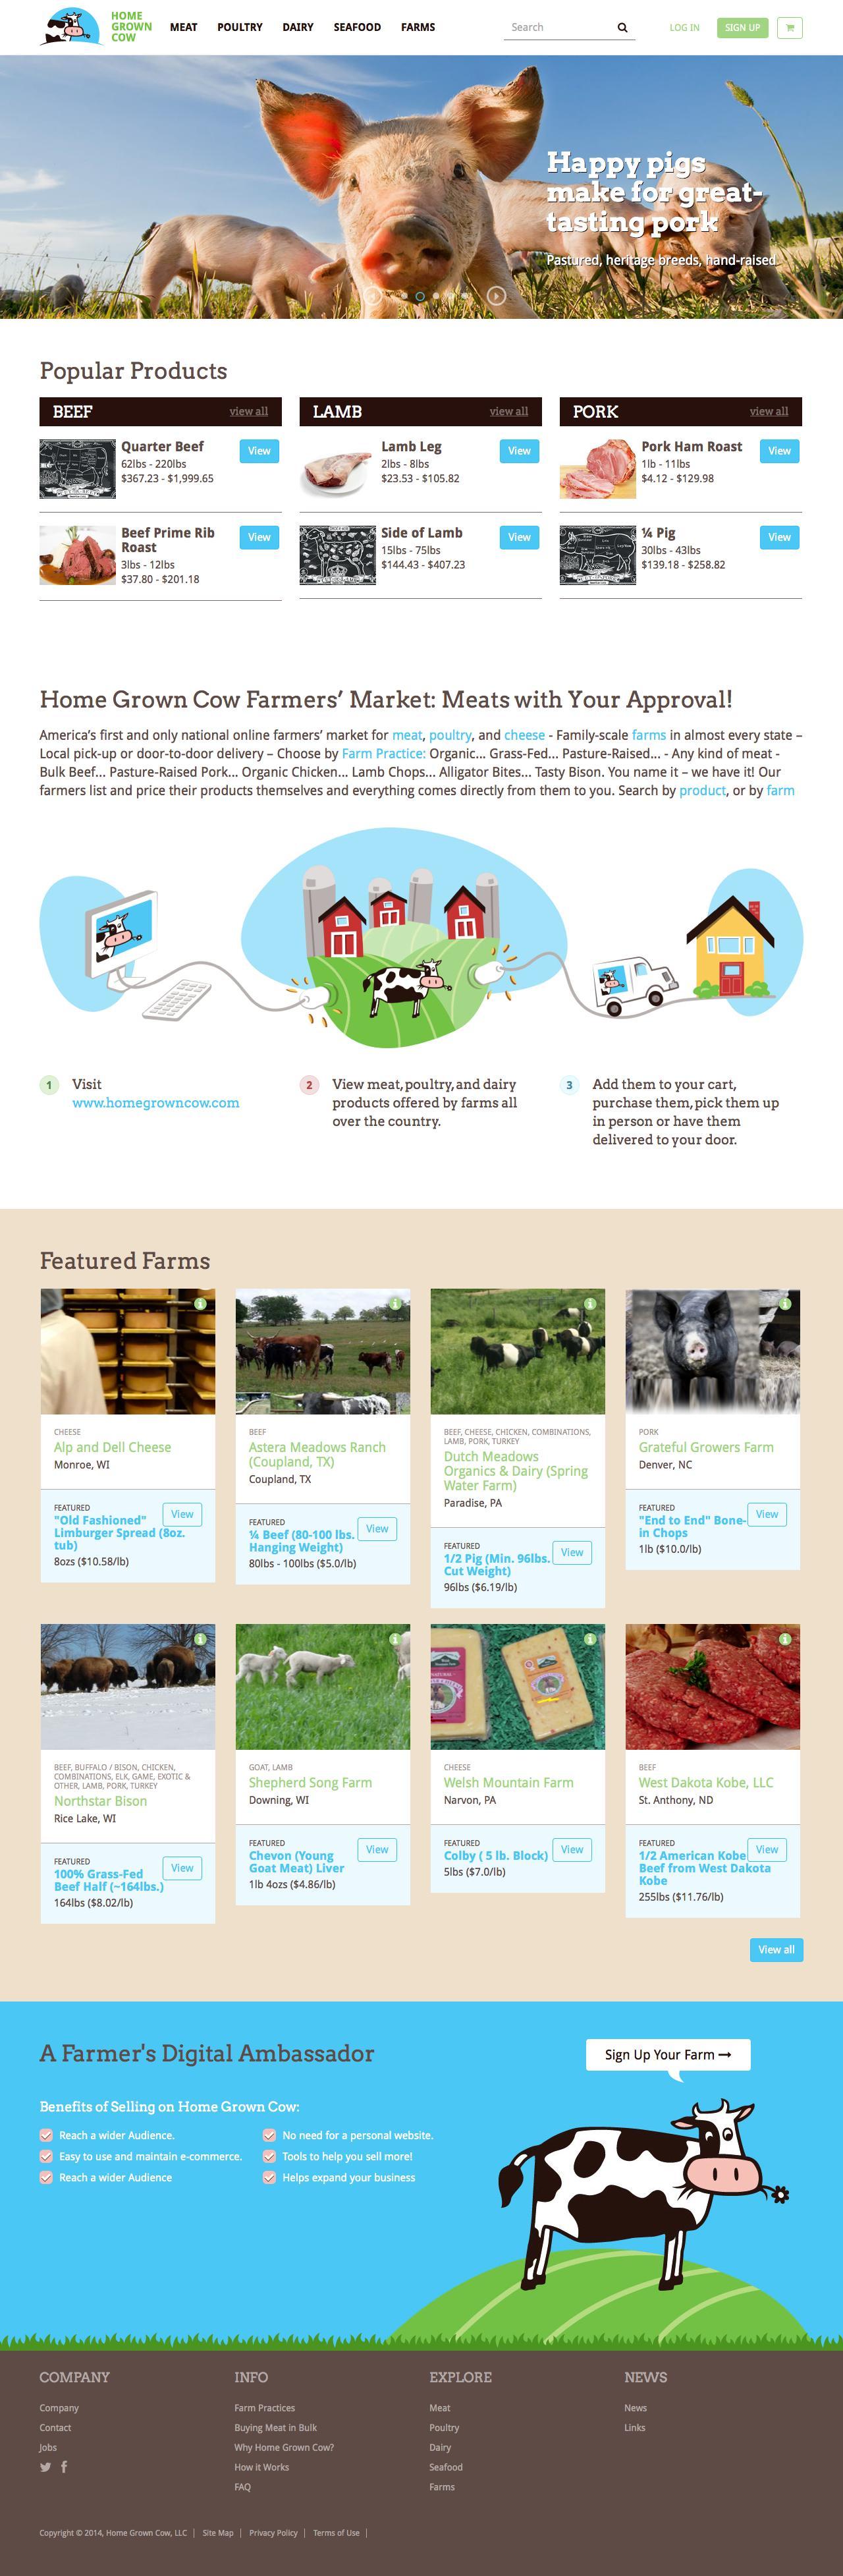 Screenshot of homegrowncow.com - Home Grown Cow - America's Favorite Online Farmers' Market - captured Oct. 11, 2014